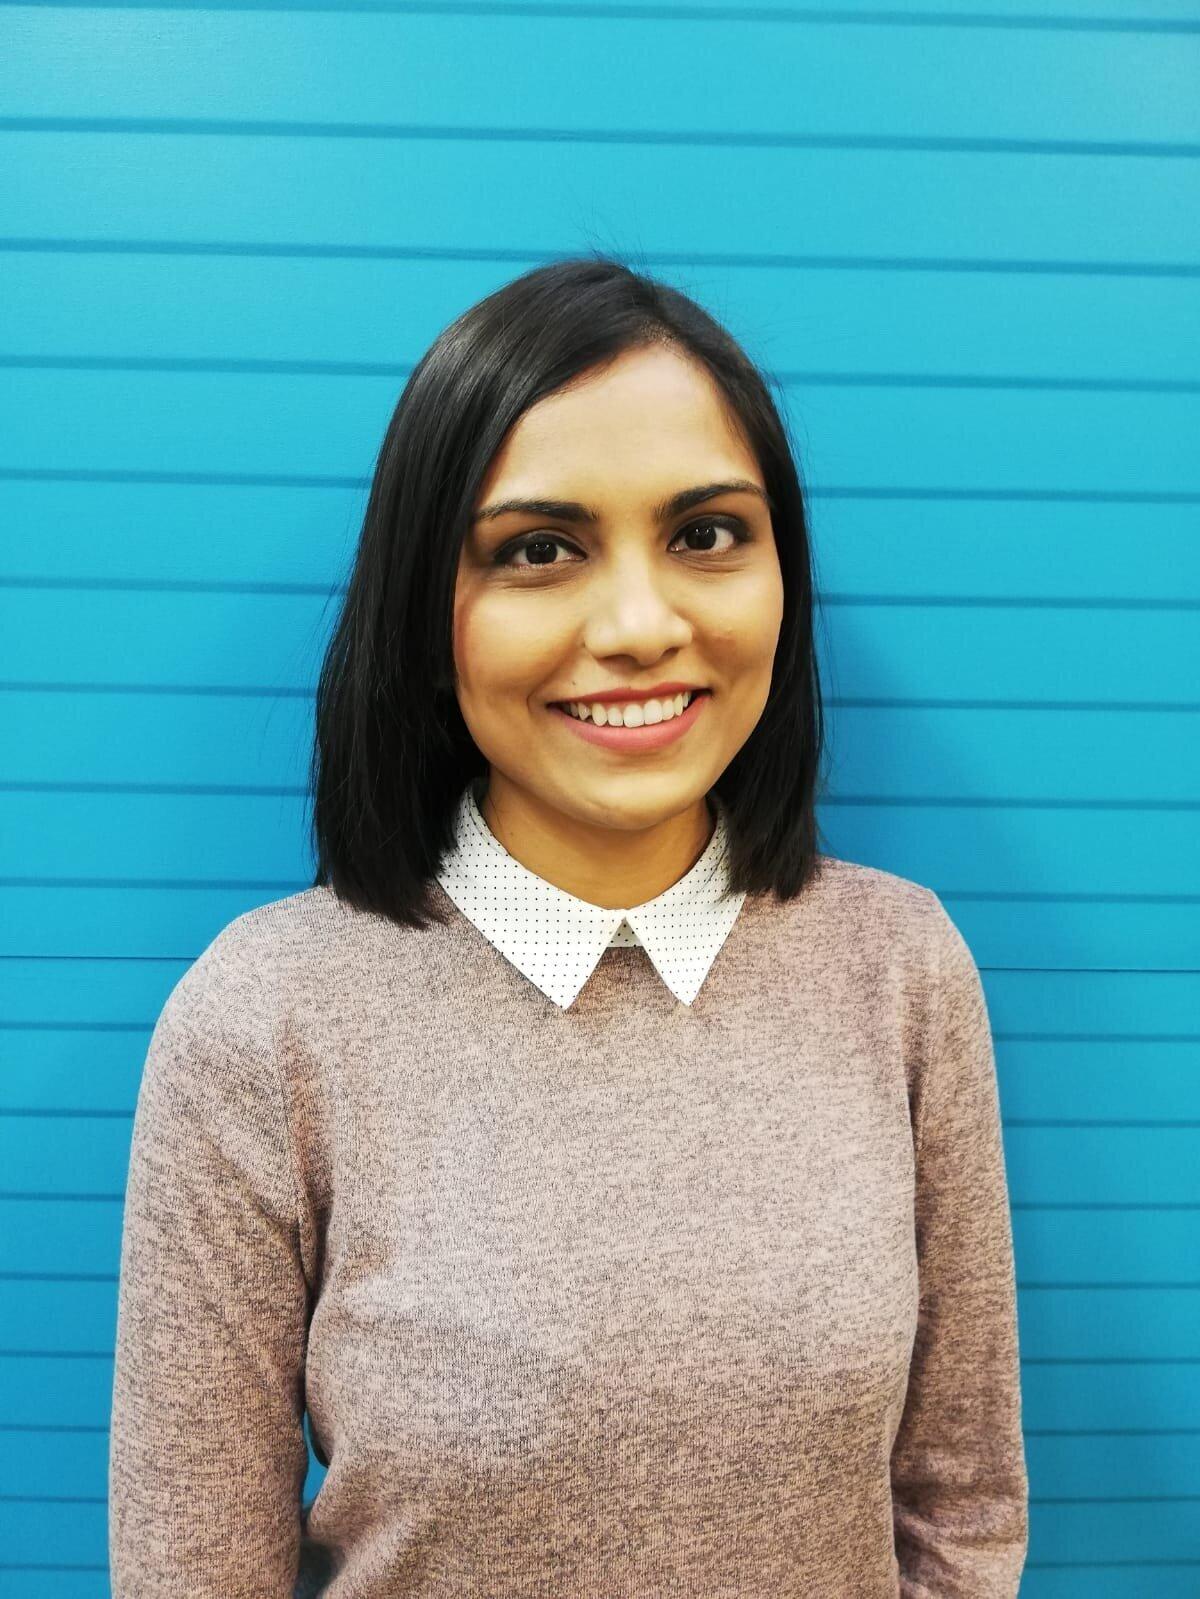 Apurva Karnavat - Digital Marketing Executive